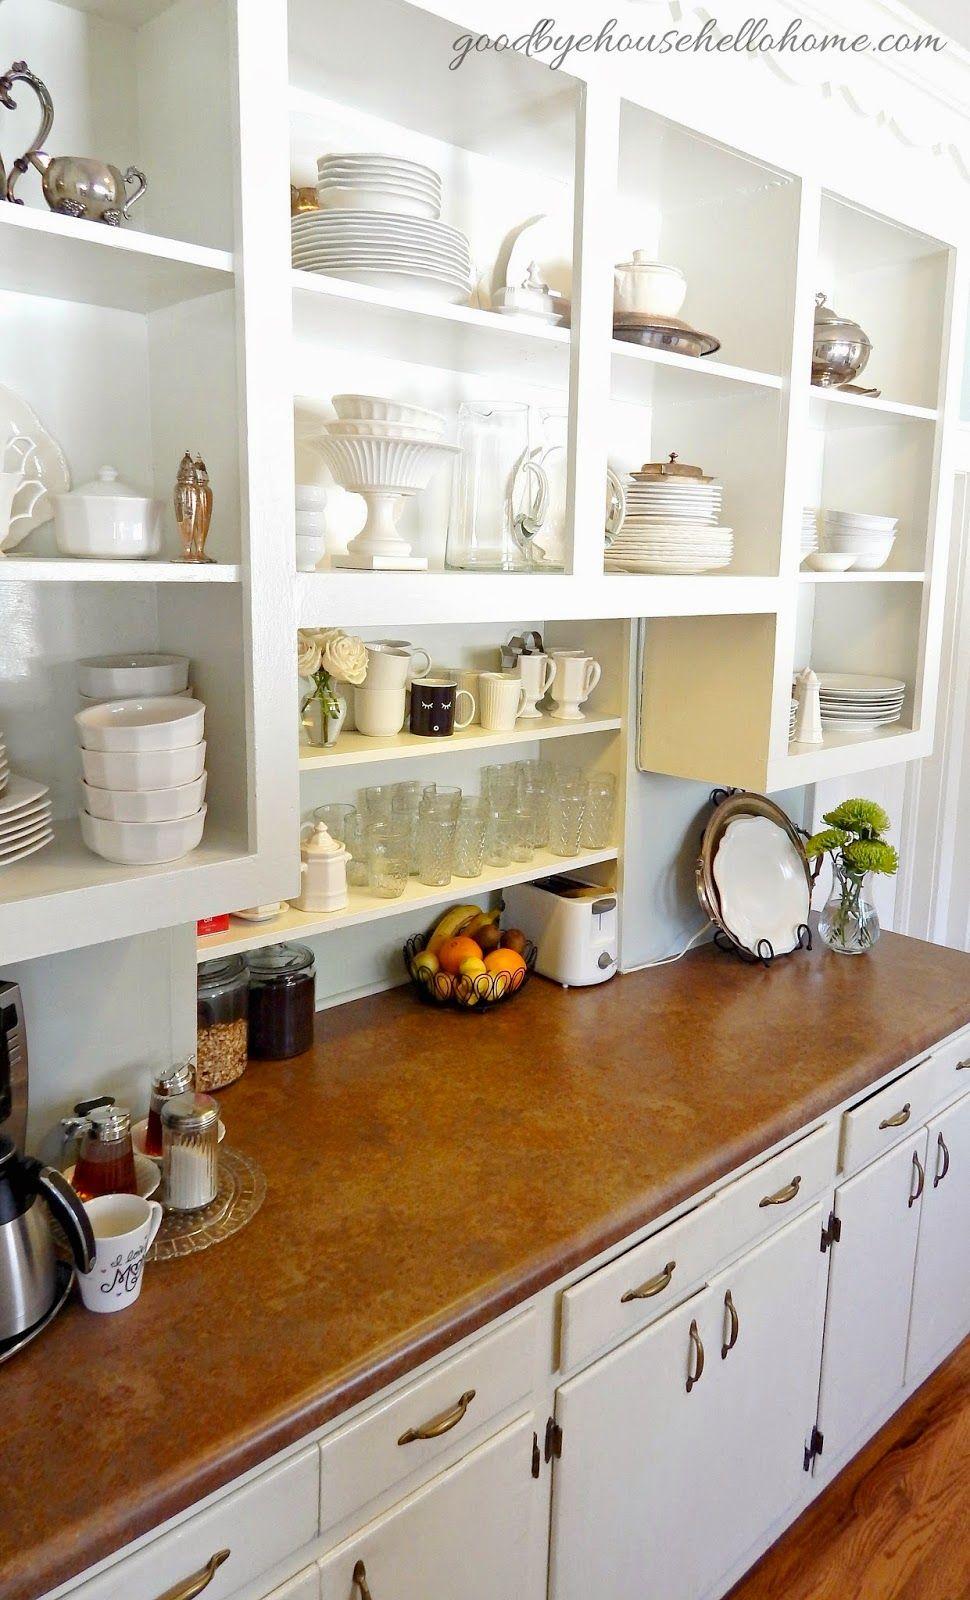 S Craftsman Bungalow Kitchen Goodbye House Hello Home - Craftsman bungalow kitchen breakfast nooks